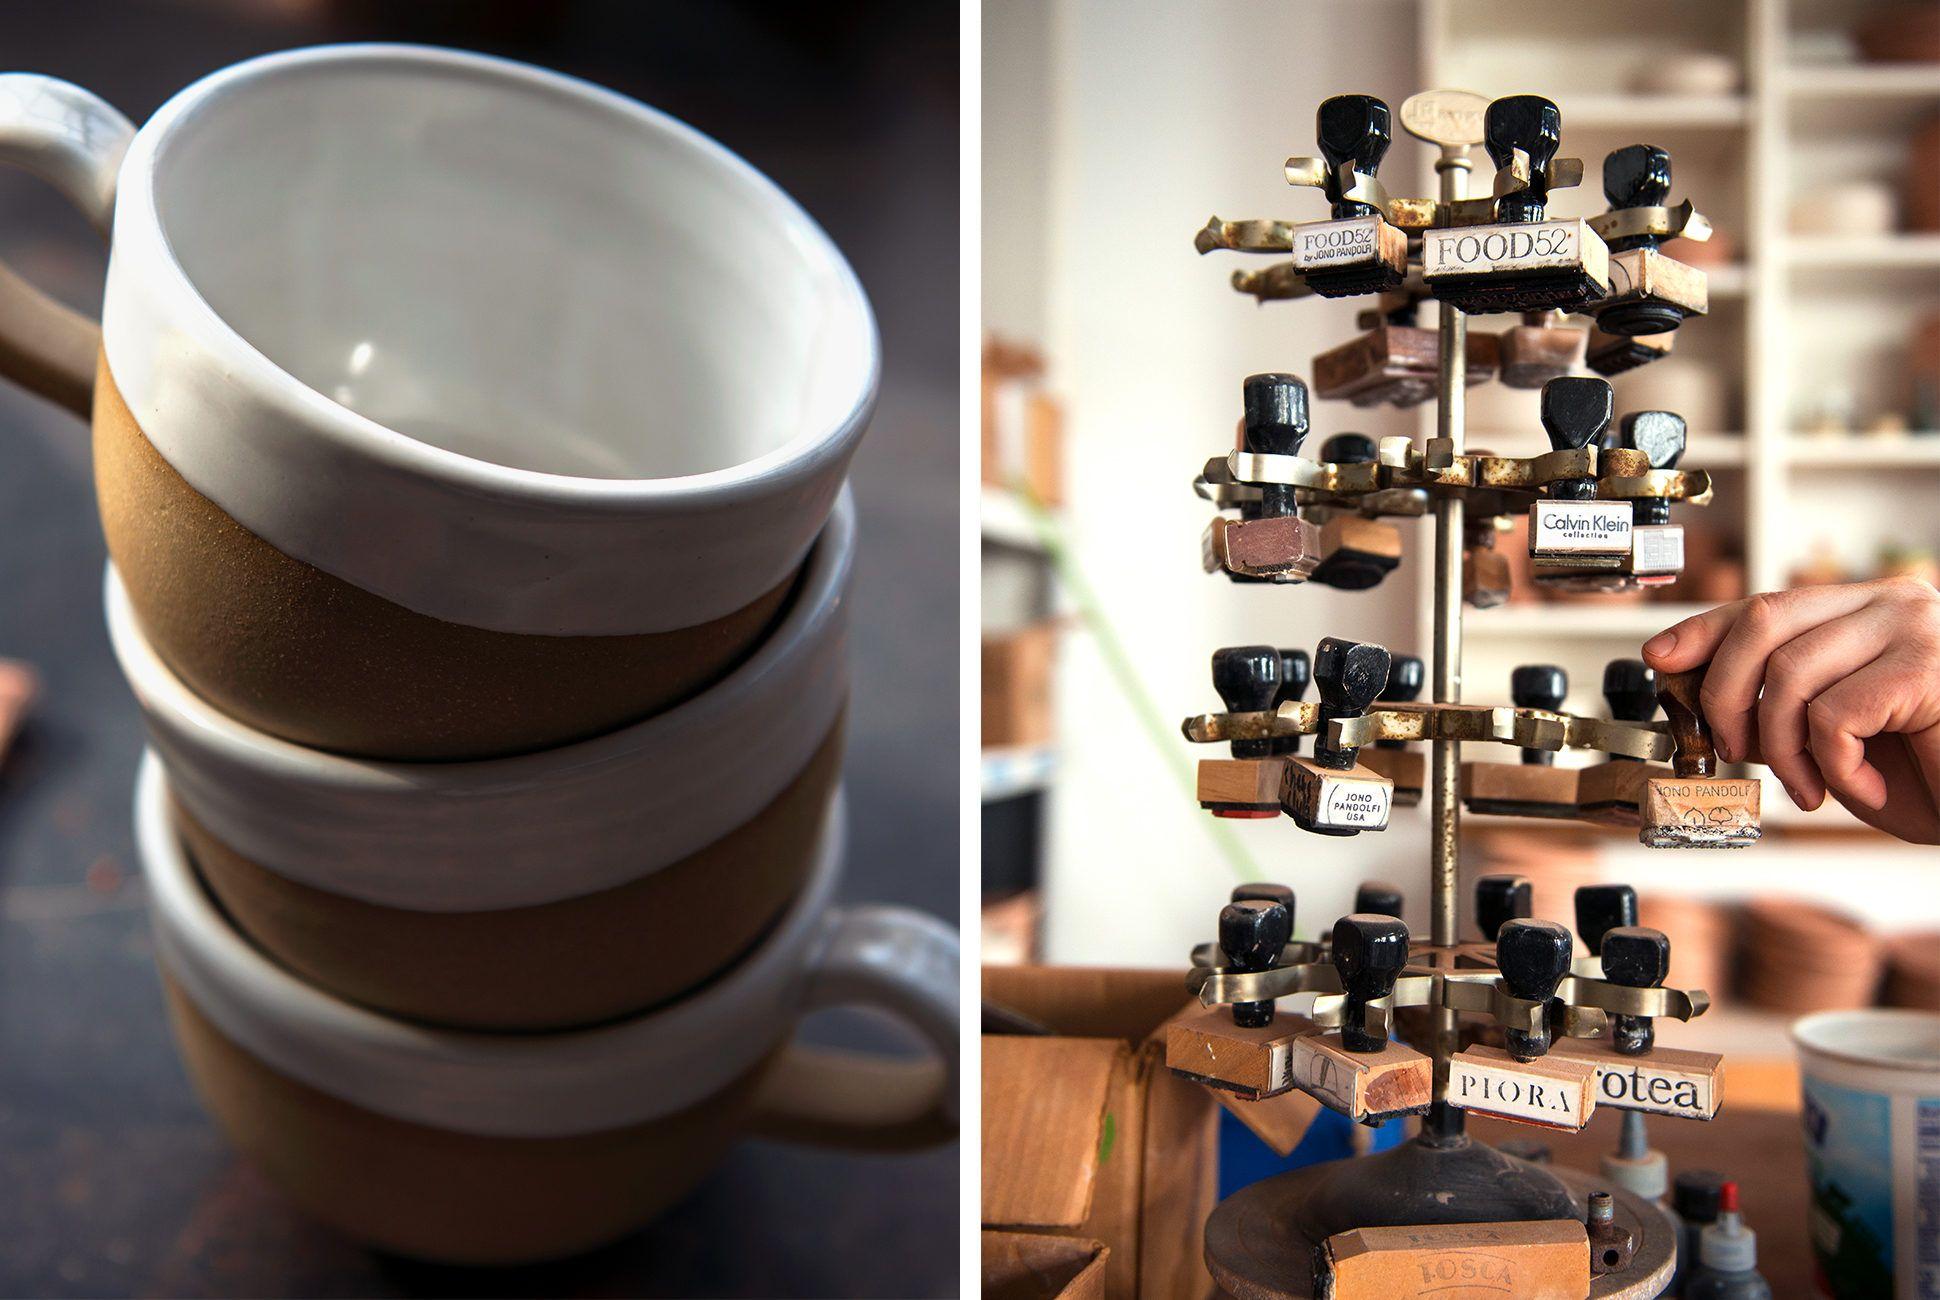 Jono-Pandolfi-pottery-gear-patrol-970-retina-8